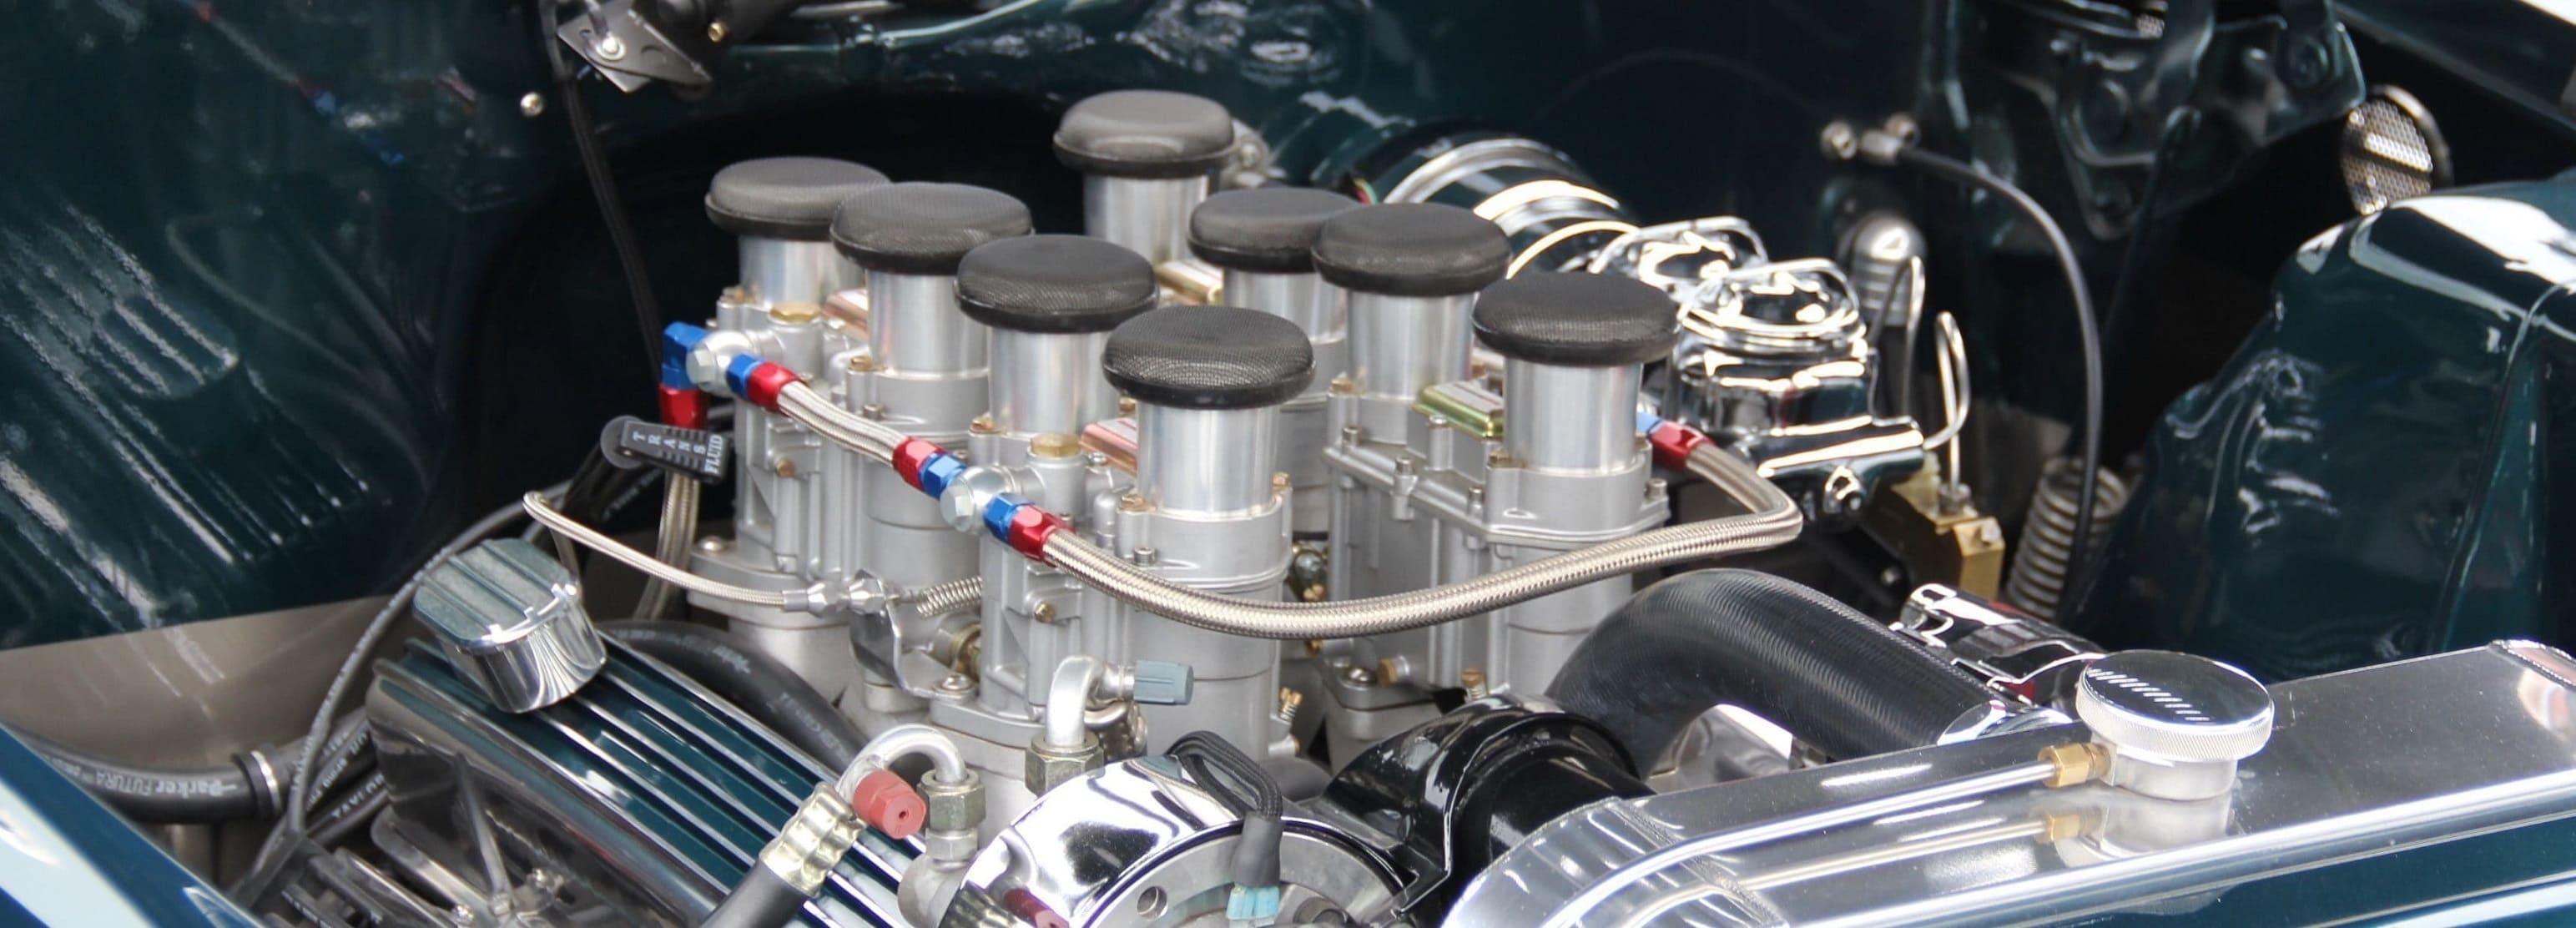 MOTORENREPARATUR - immer top Qualität - Motorencenter